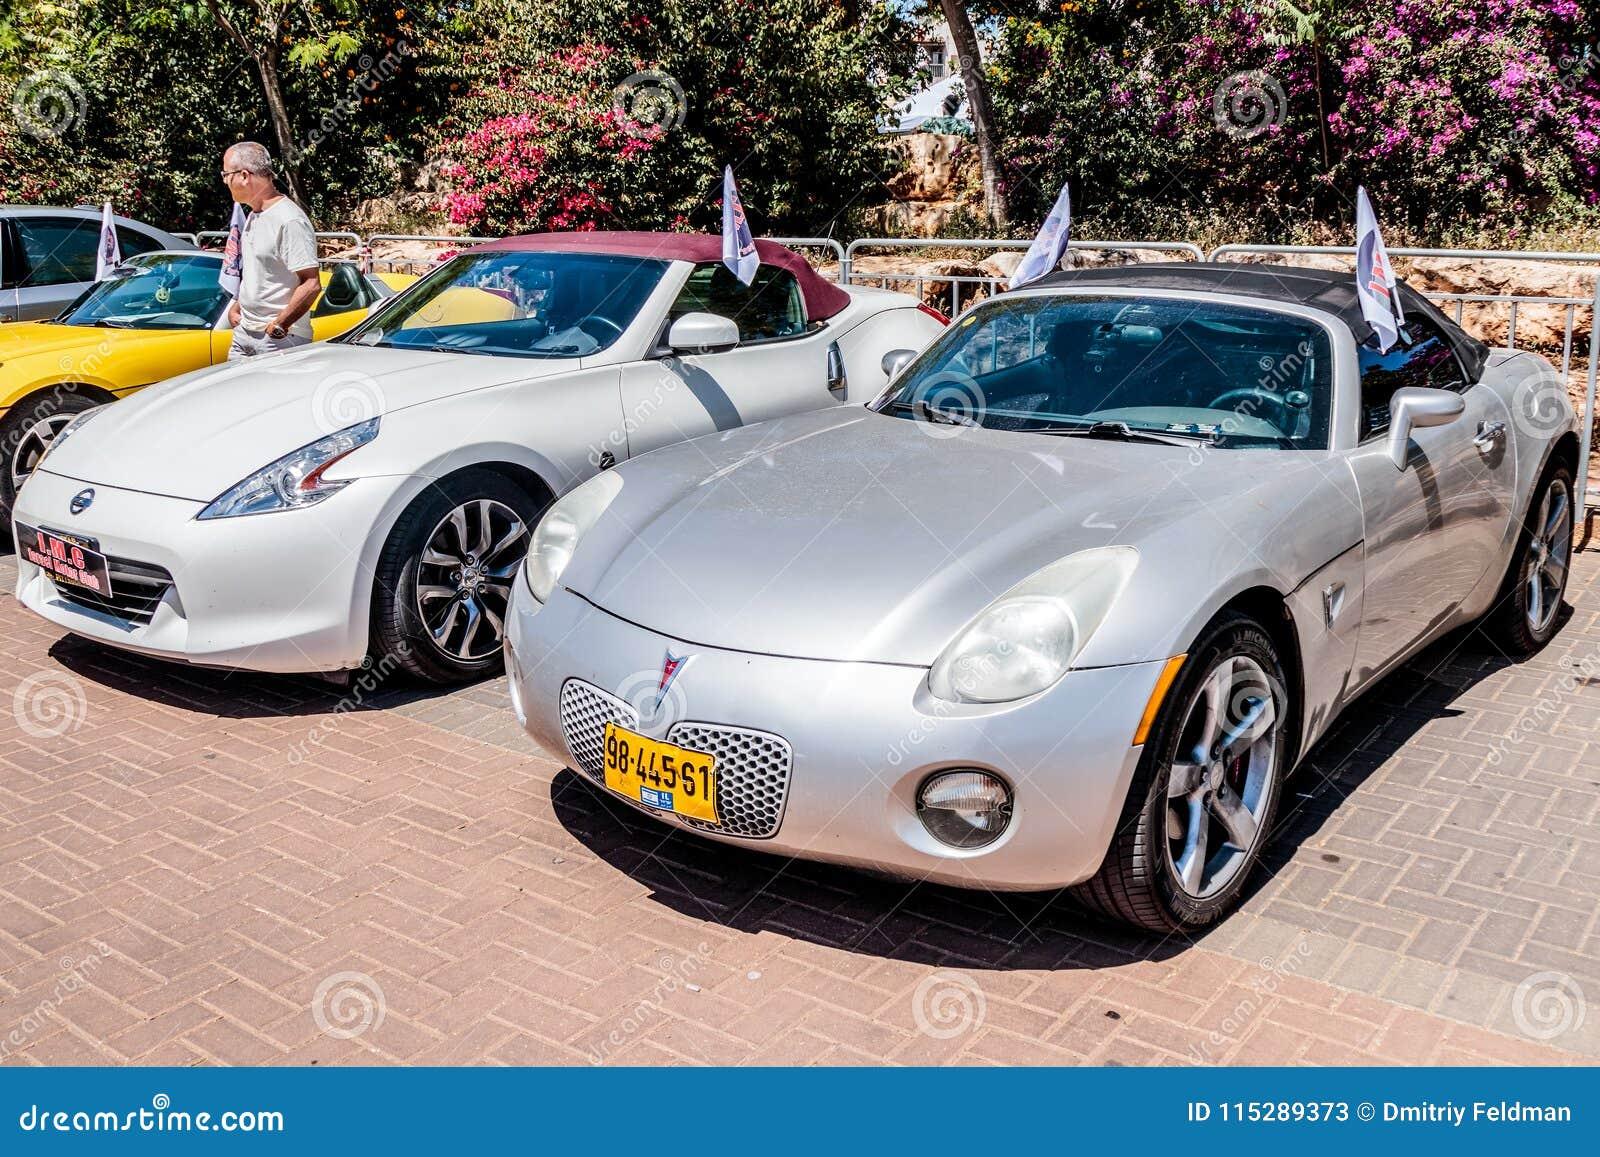 Sports Pontiac Cabriolet And Sports Nissan 370Z Cabriolet